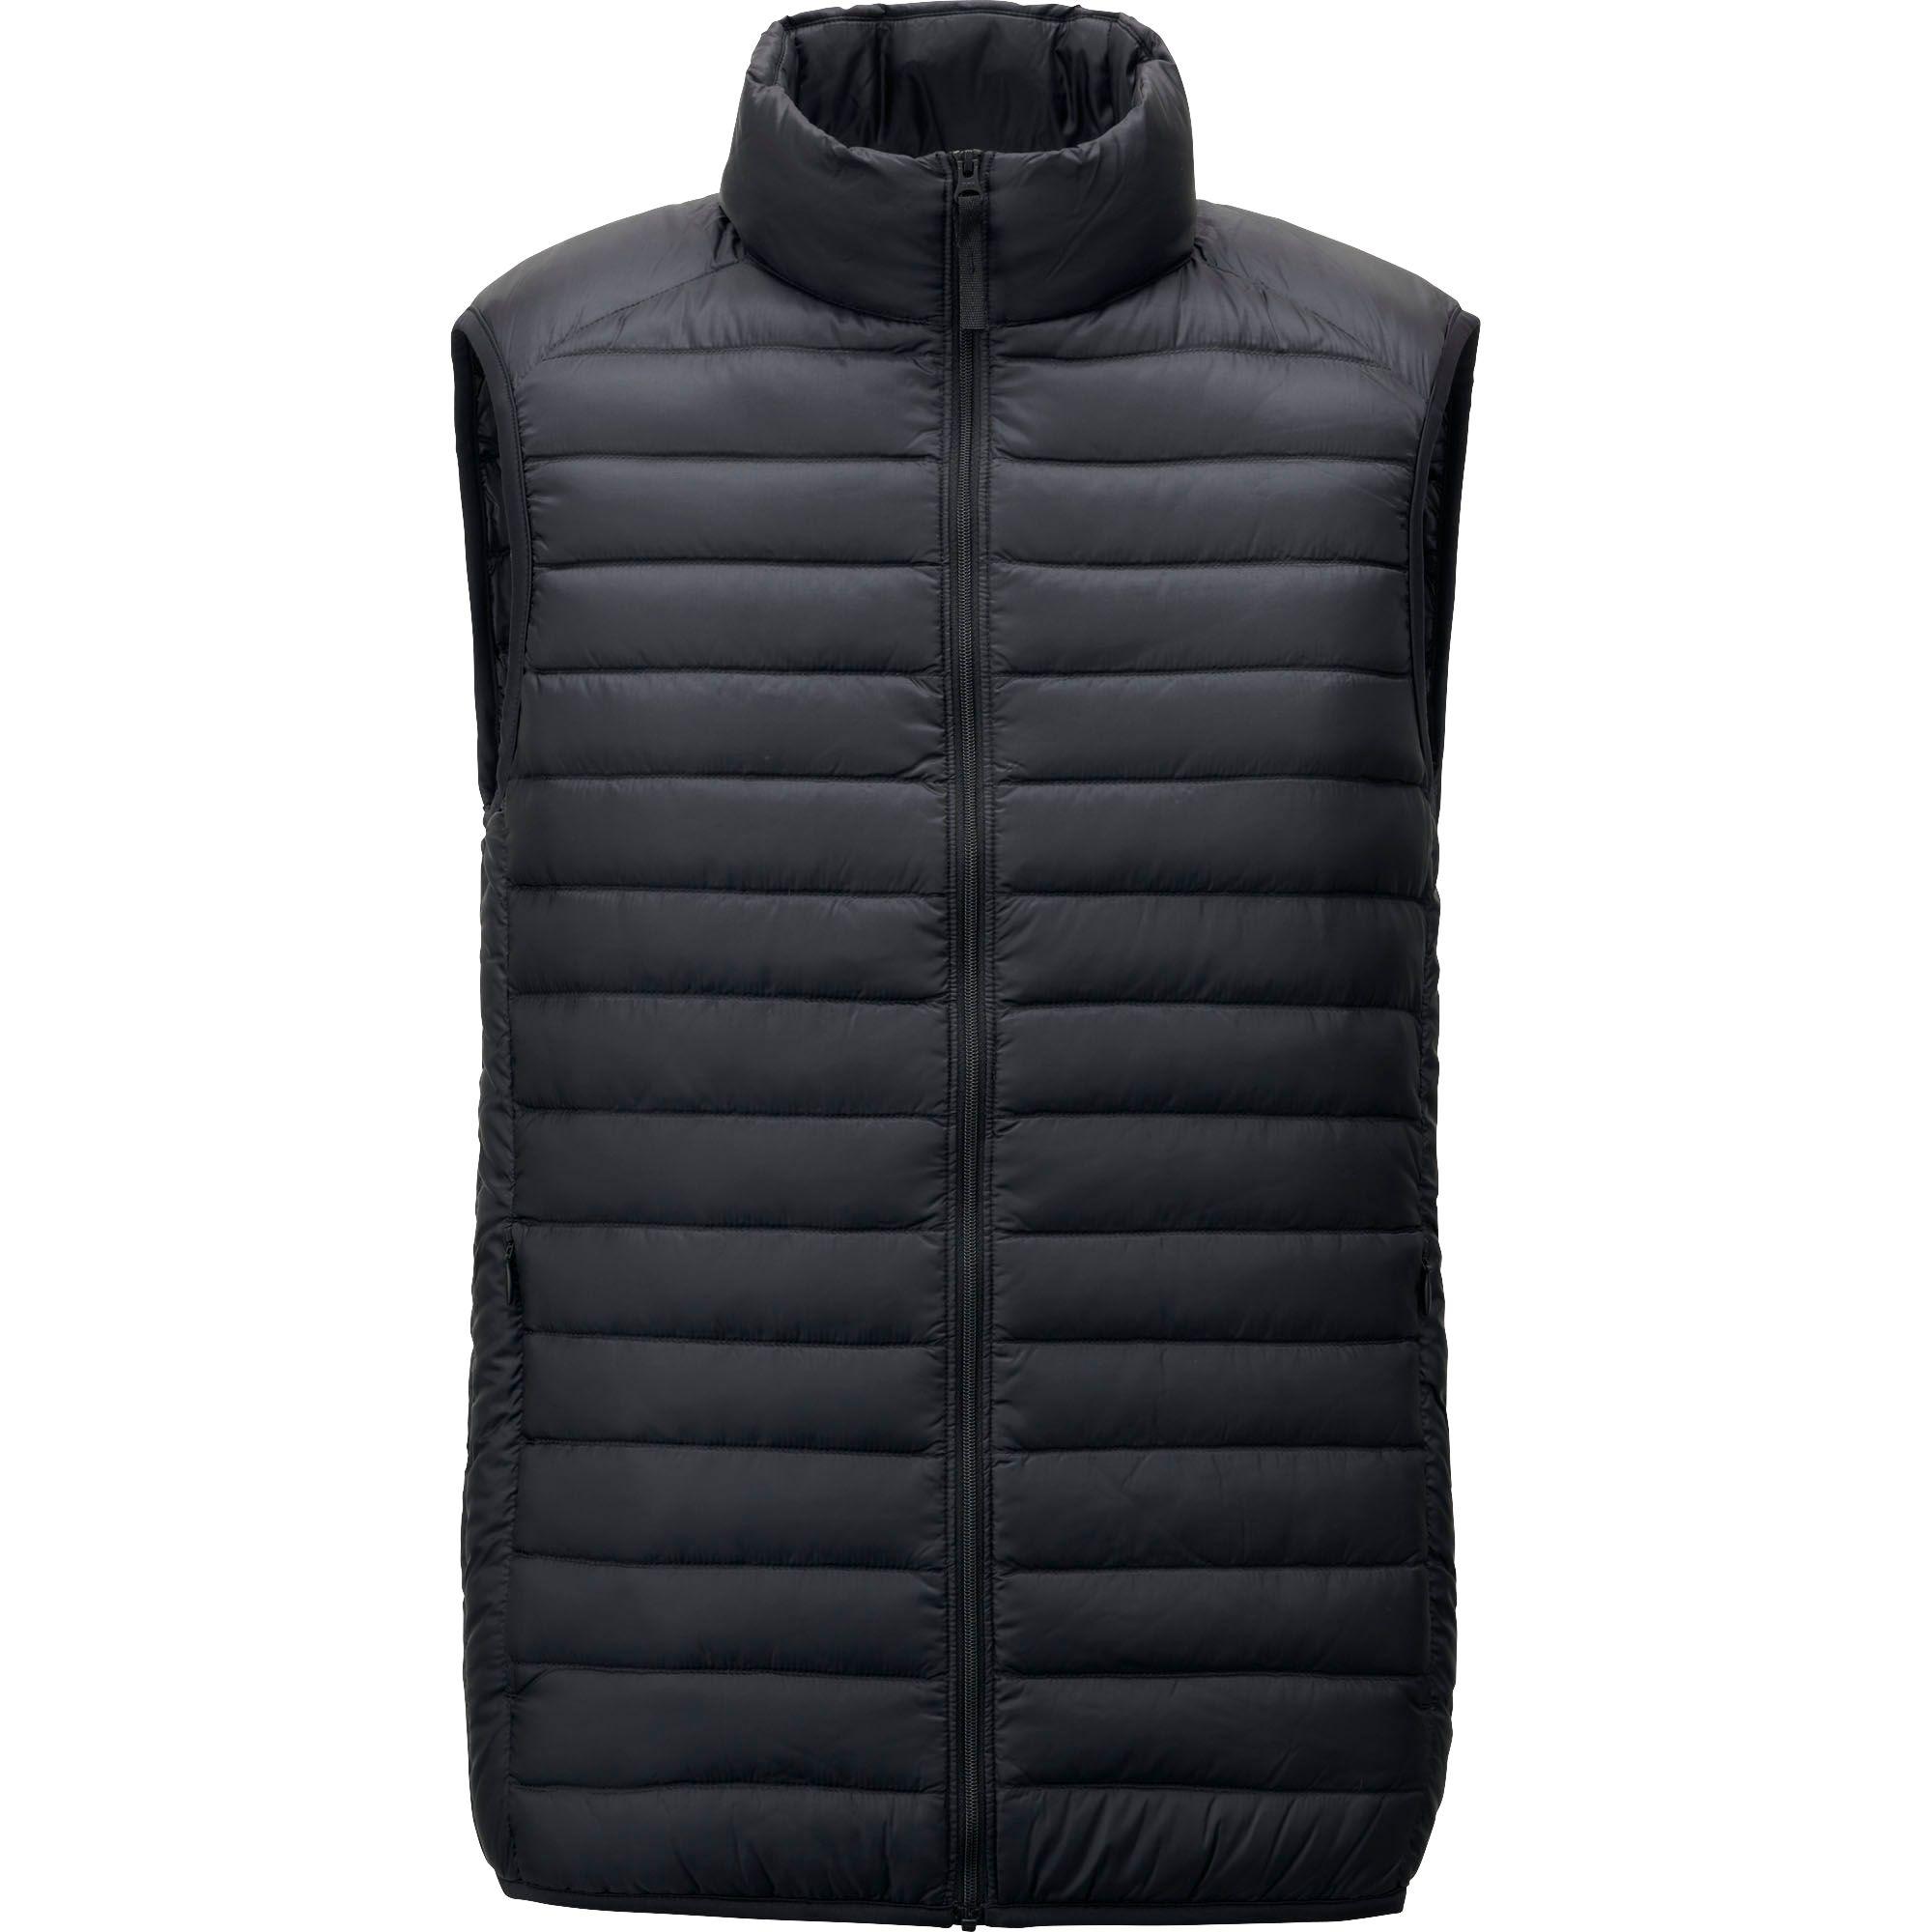 Uniqlo Men Ultra Light Down Vest In Black For Men Lyst